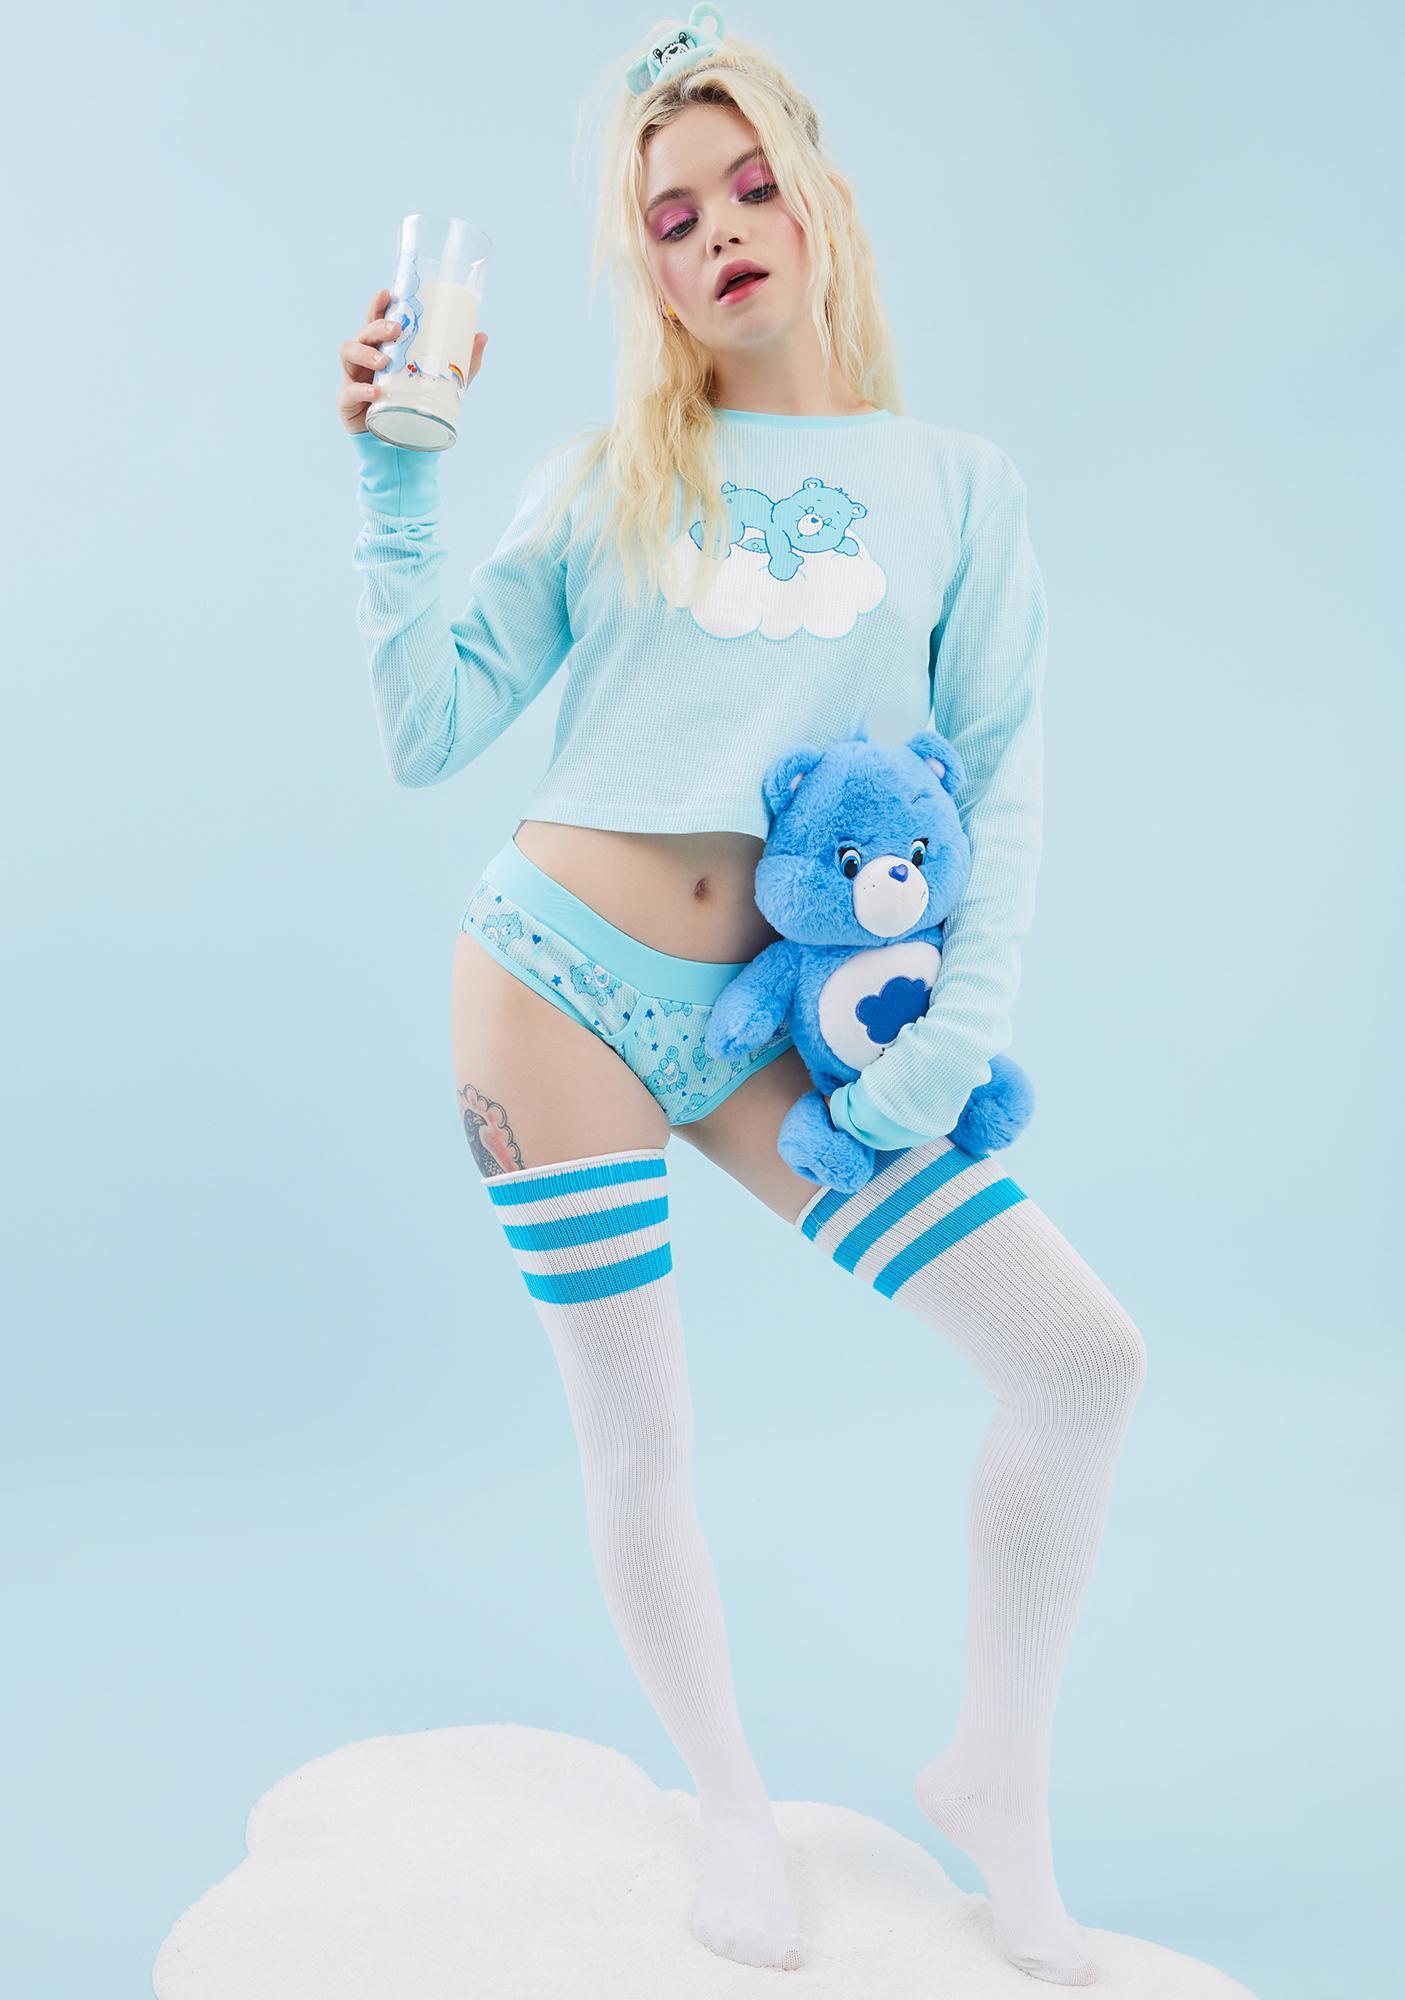 Dolls Kill x Care Bears Cuddle Puddle Brief Undies